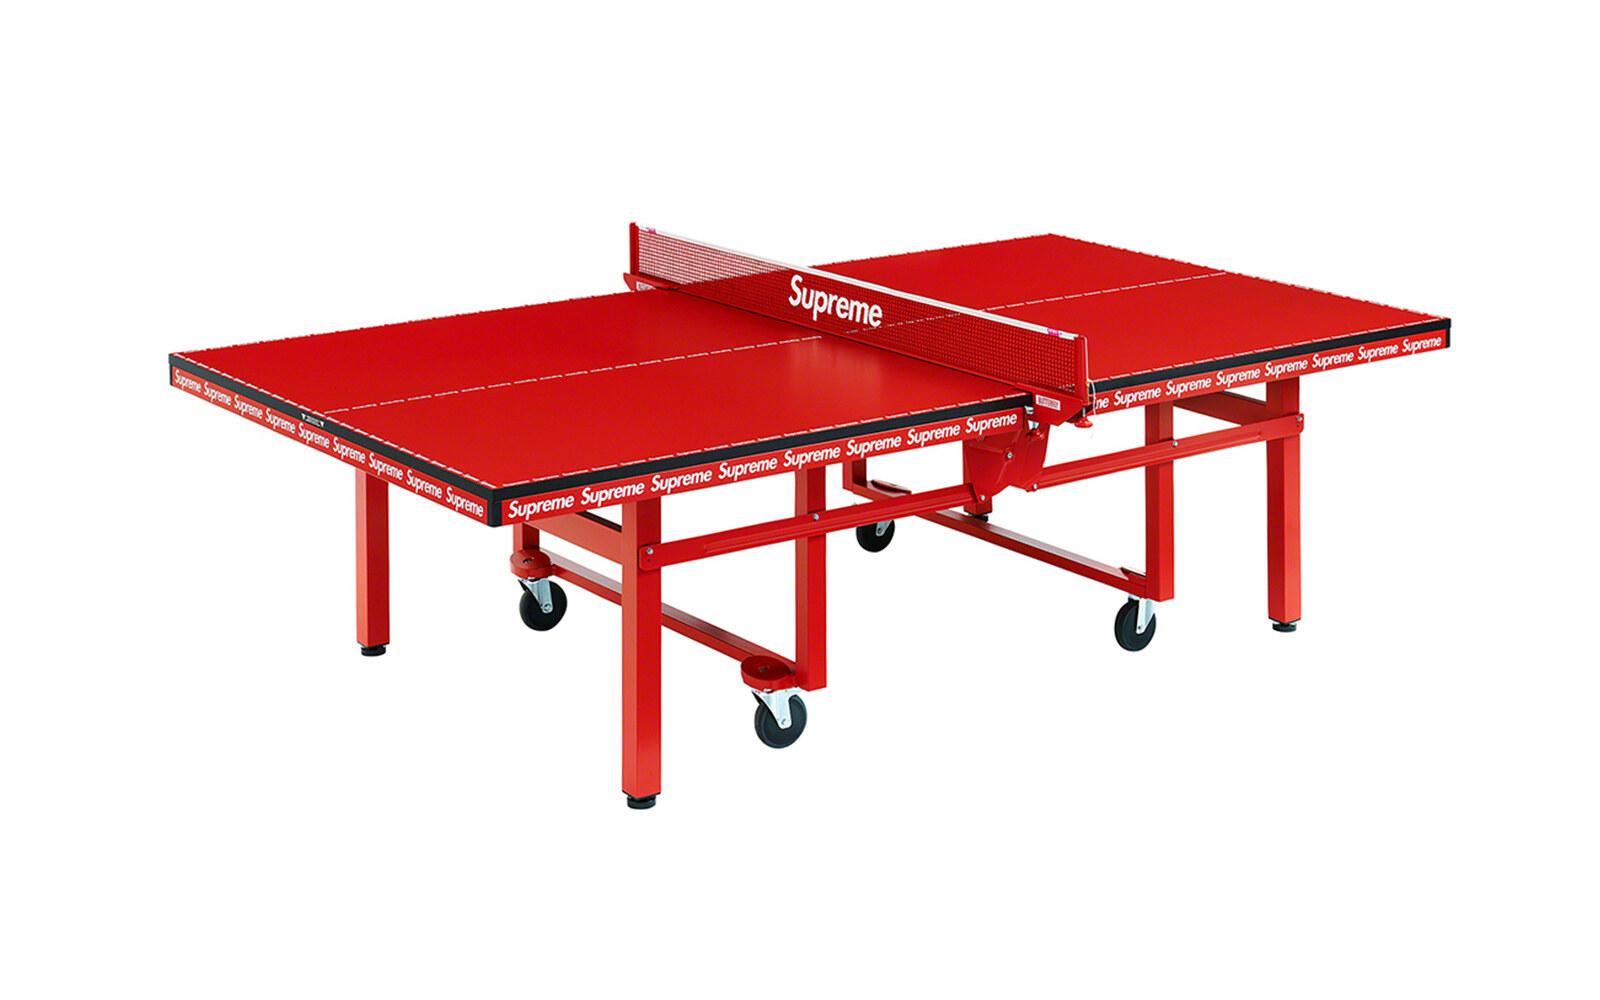 Supreme Fall Winter 2021 ping pong